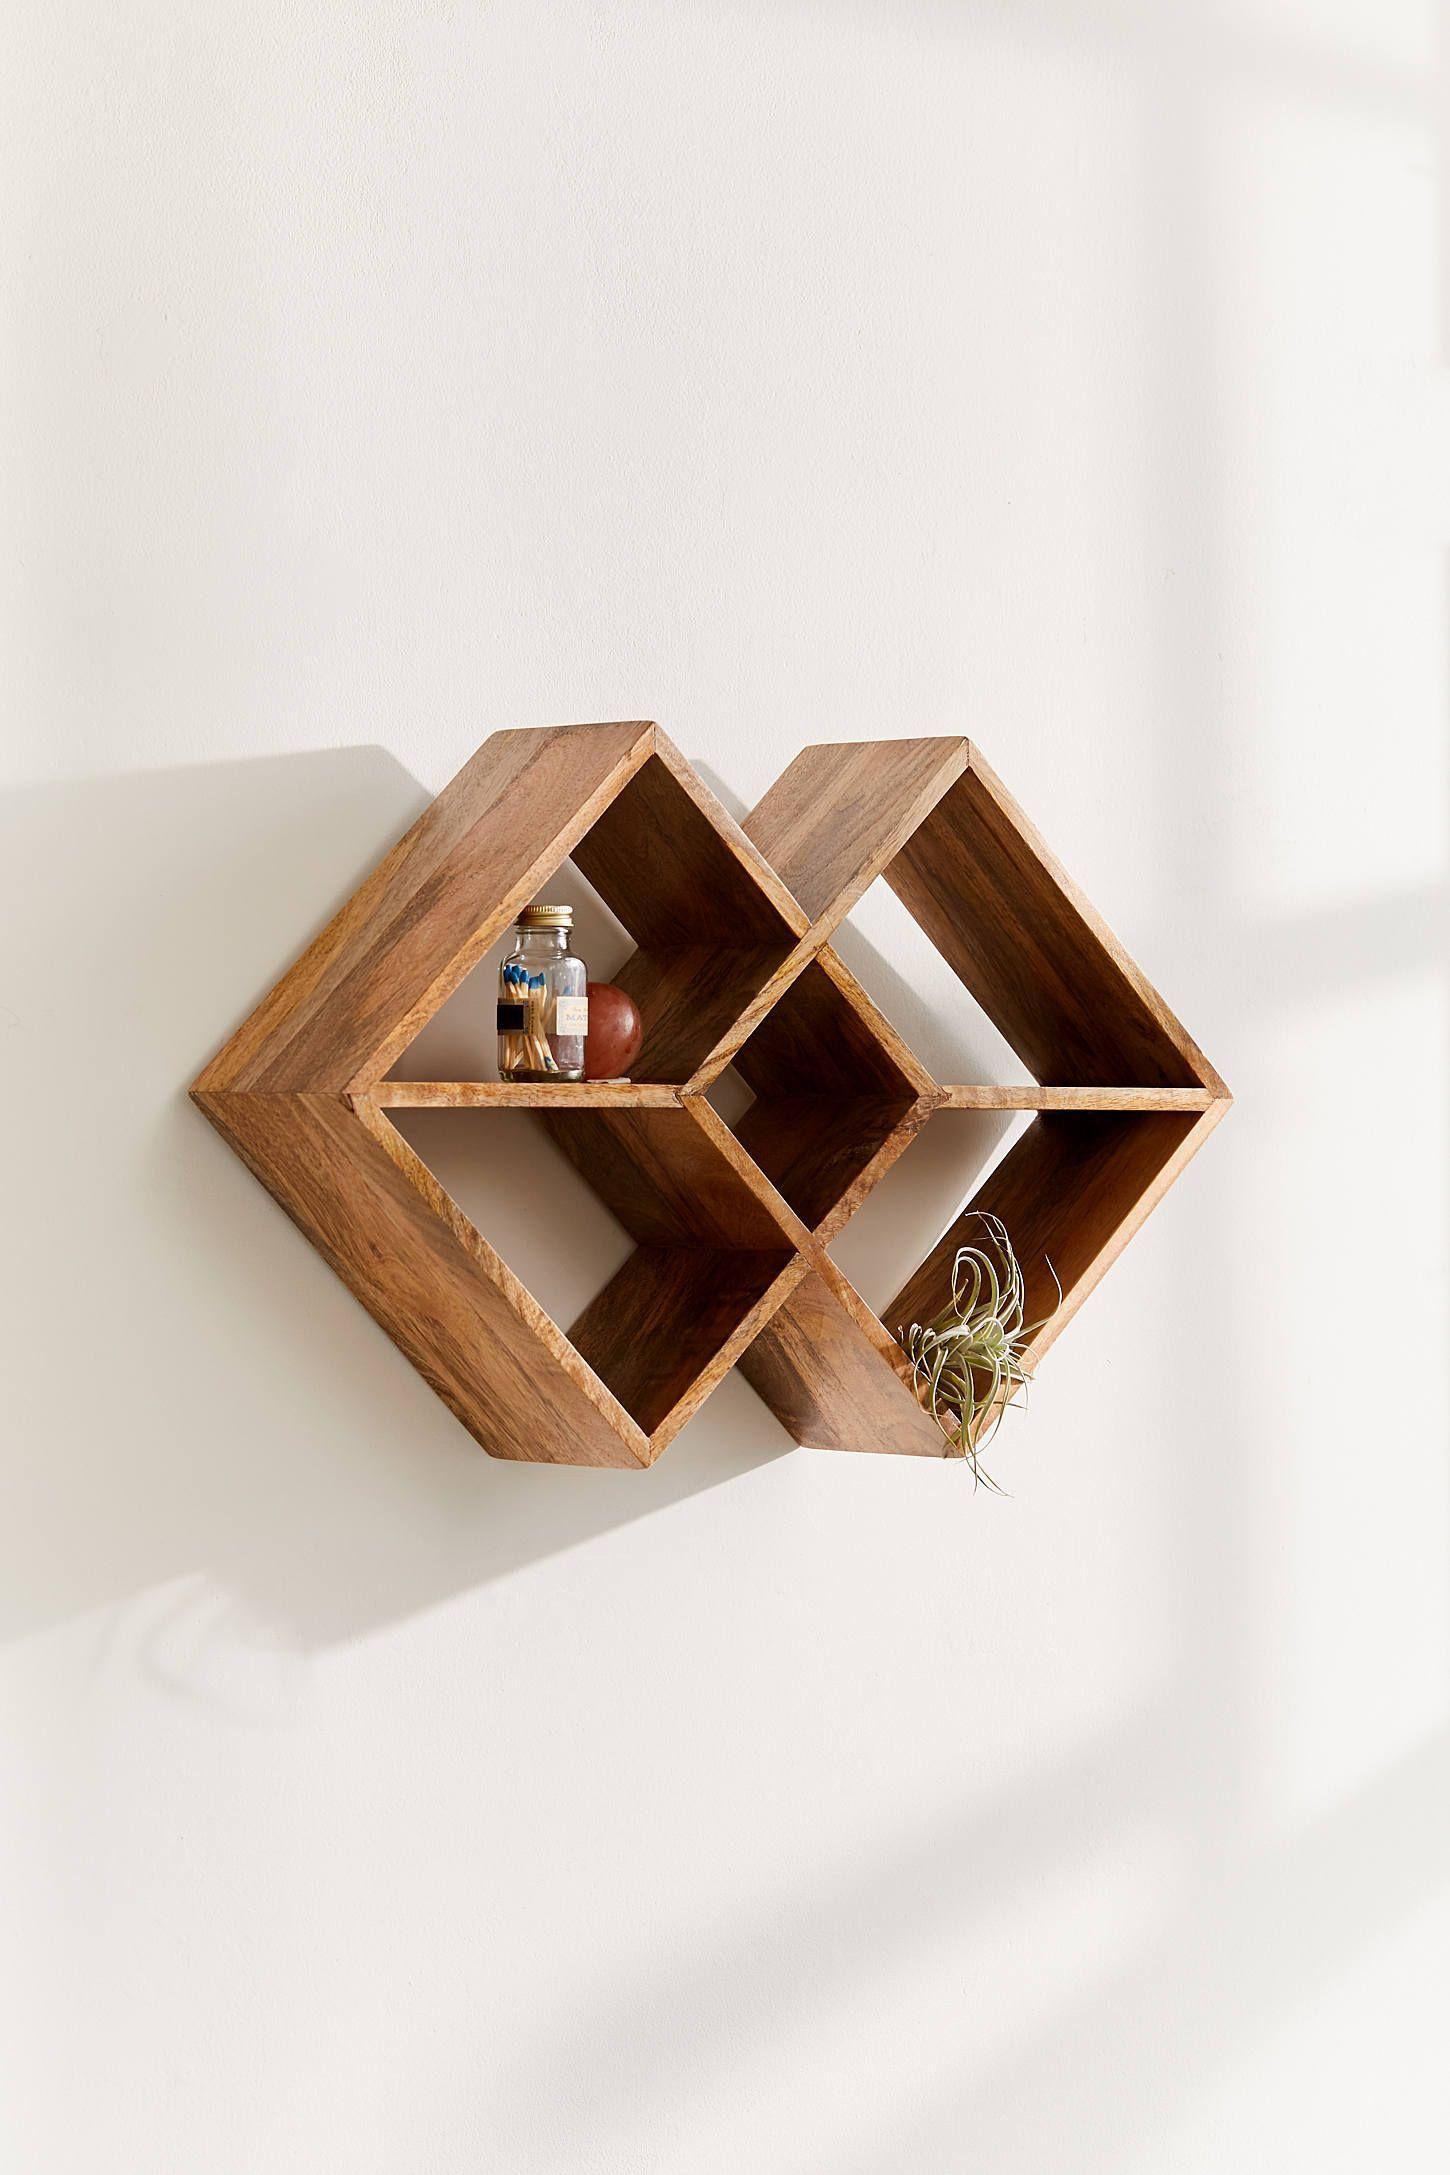 Palletshelves Pallet Shelves Wood Wall Shelf Wood Projects For Beginners